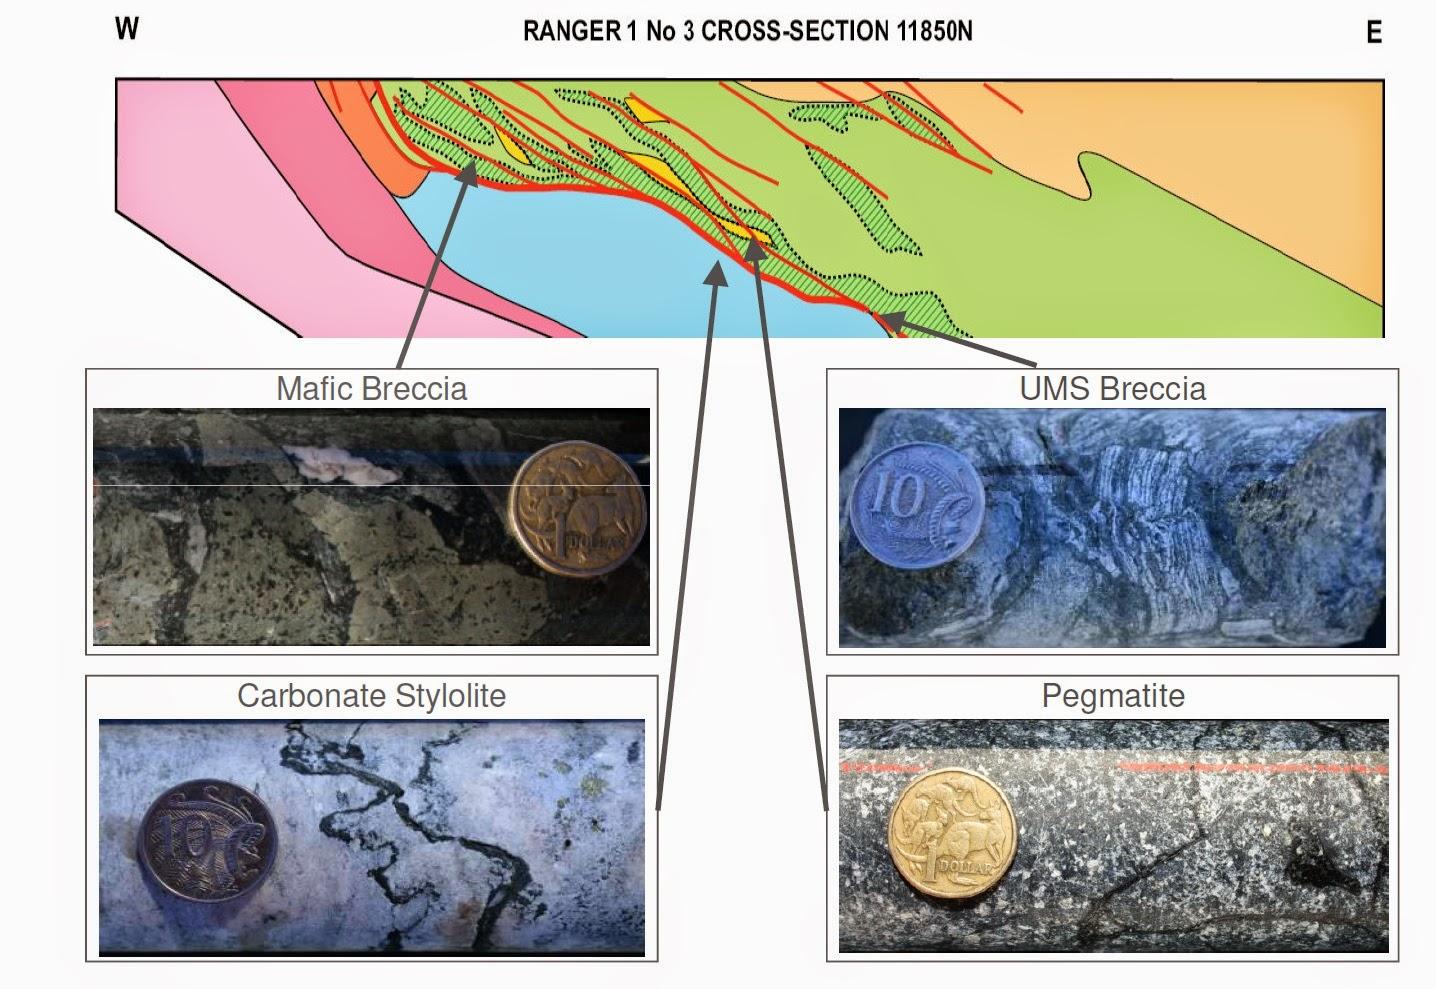 Uranium mineralization